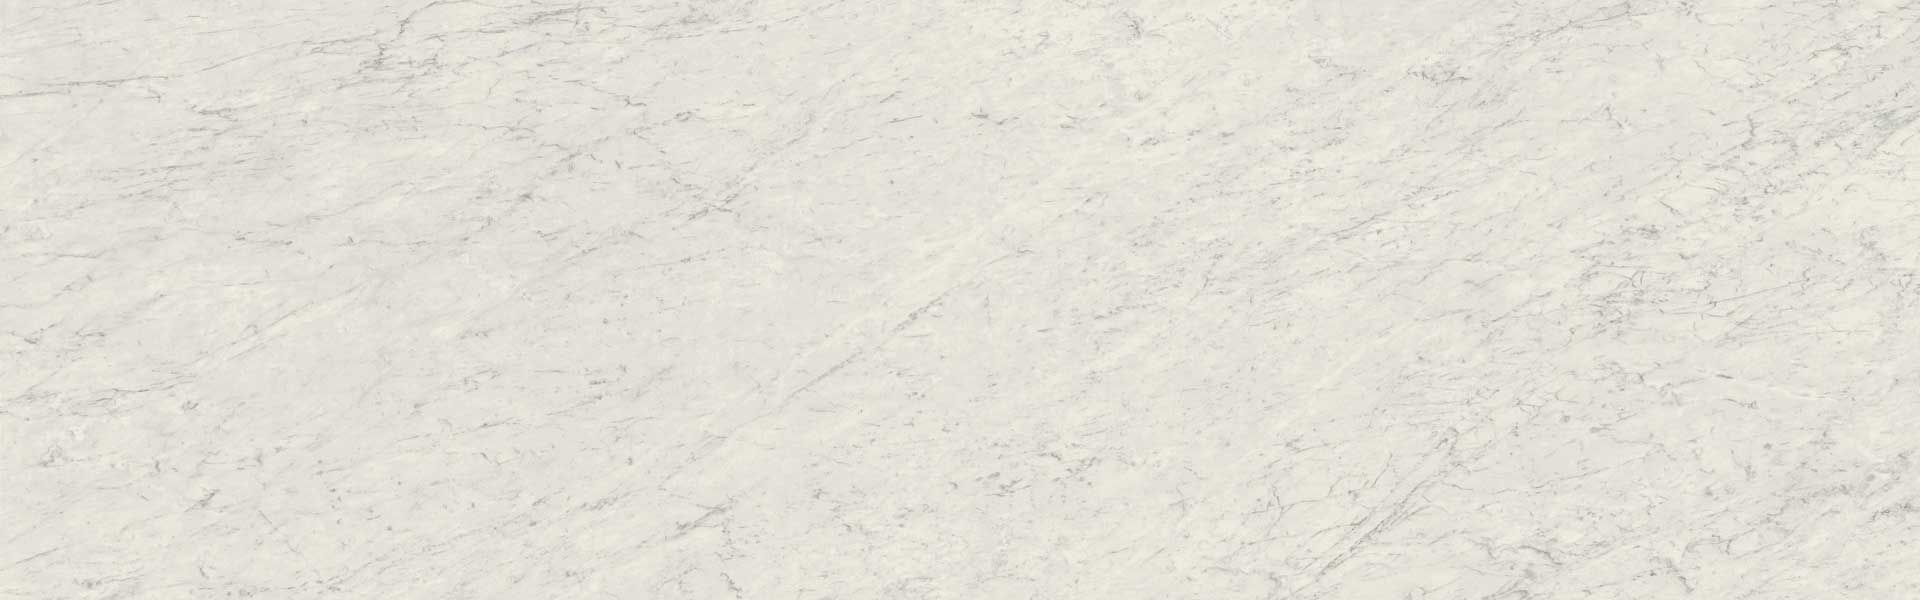 Carrara Pure